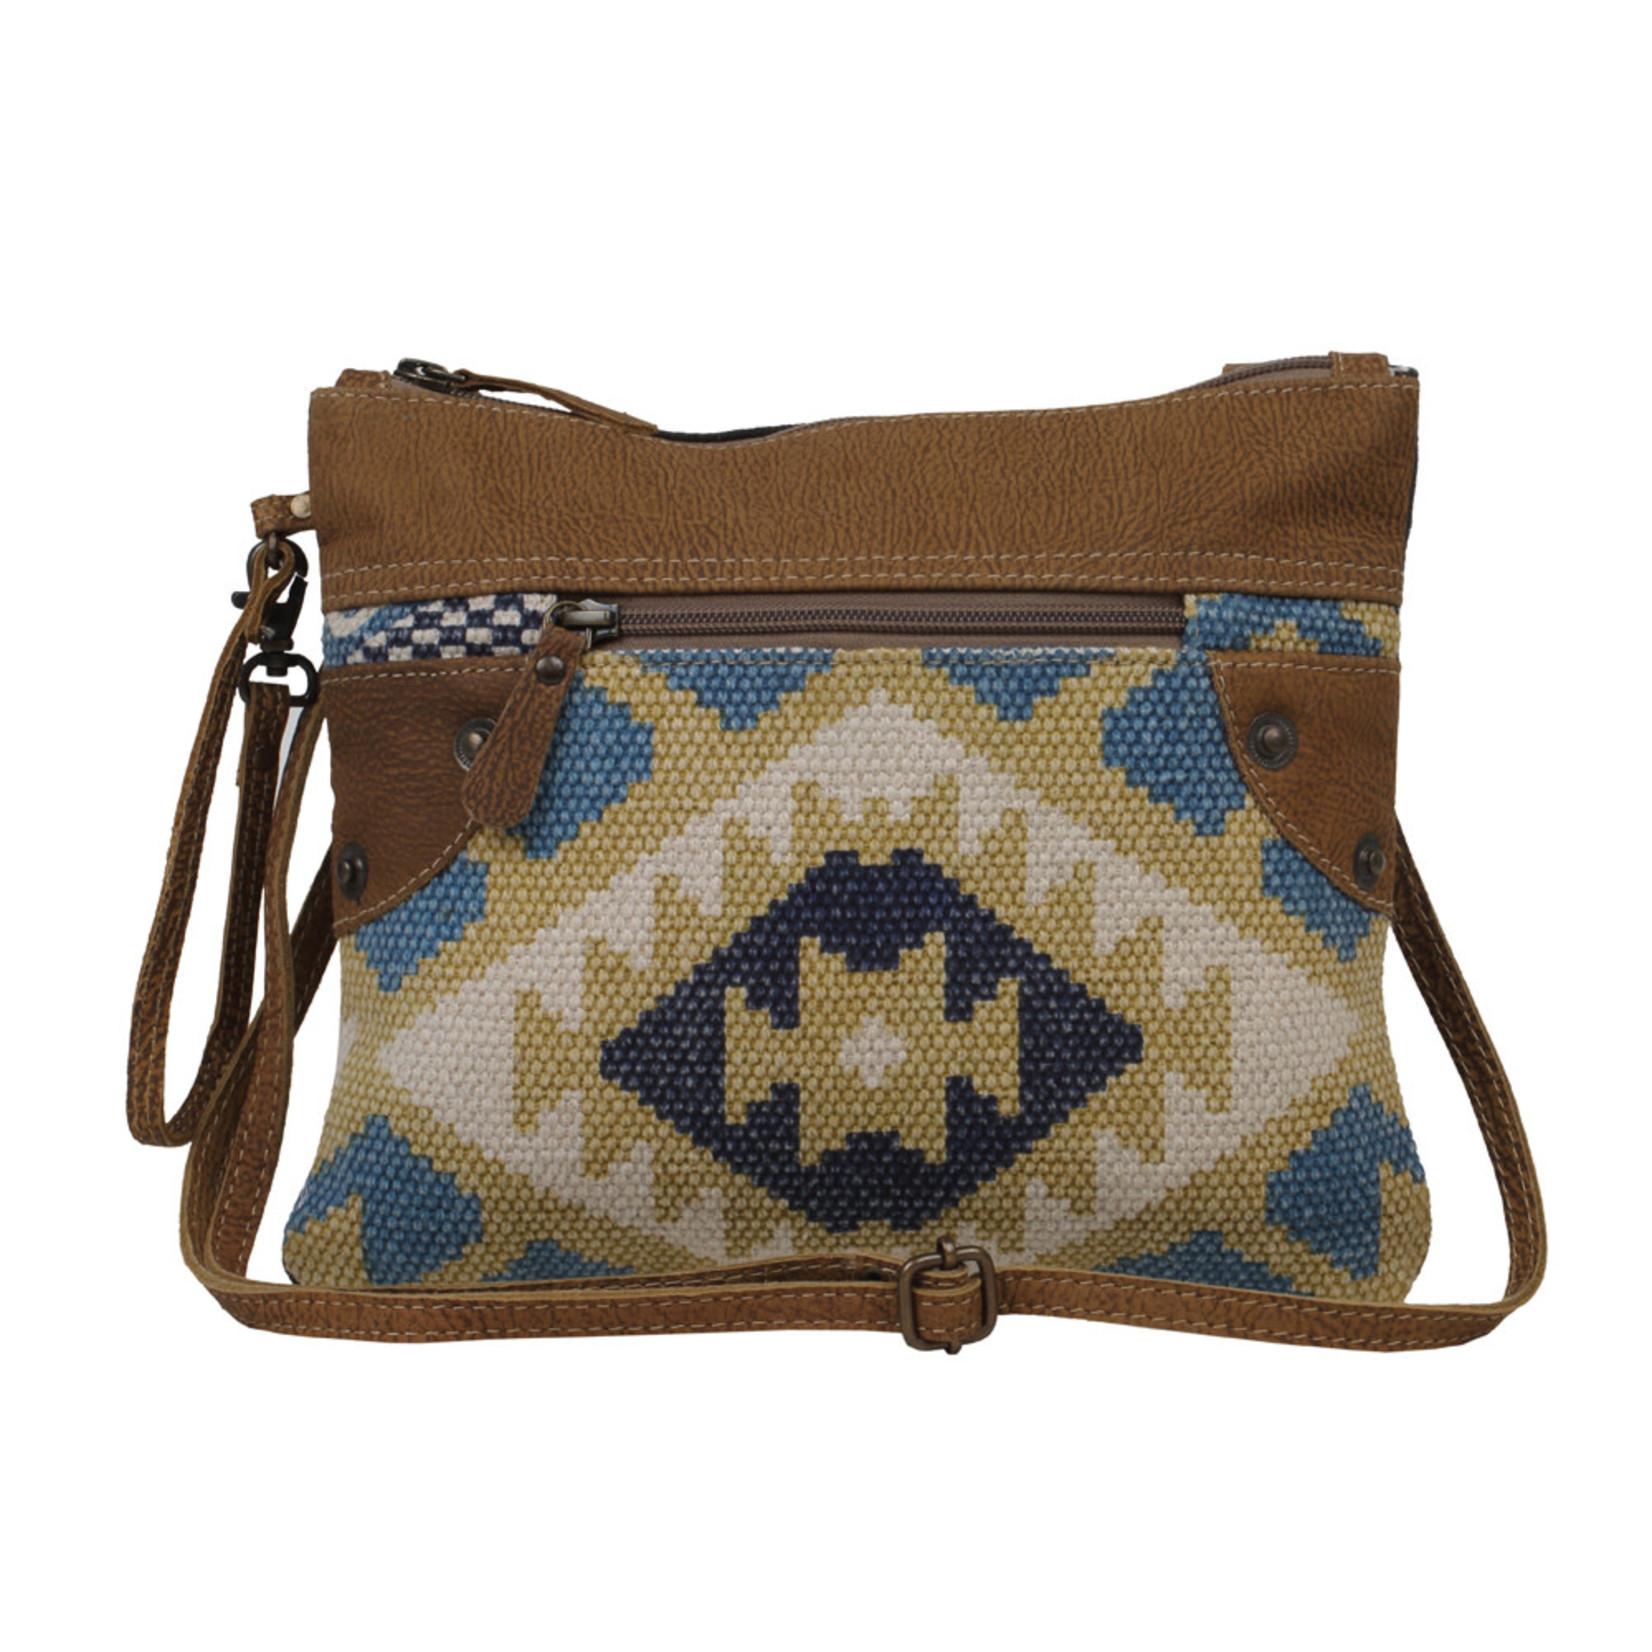 Myra Bags S-2636 Tough Small Crossbody Bag